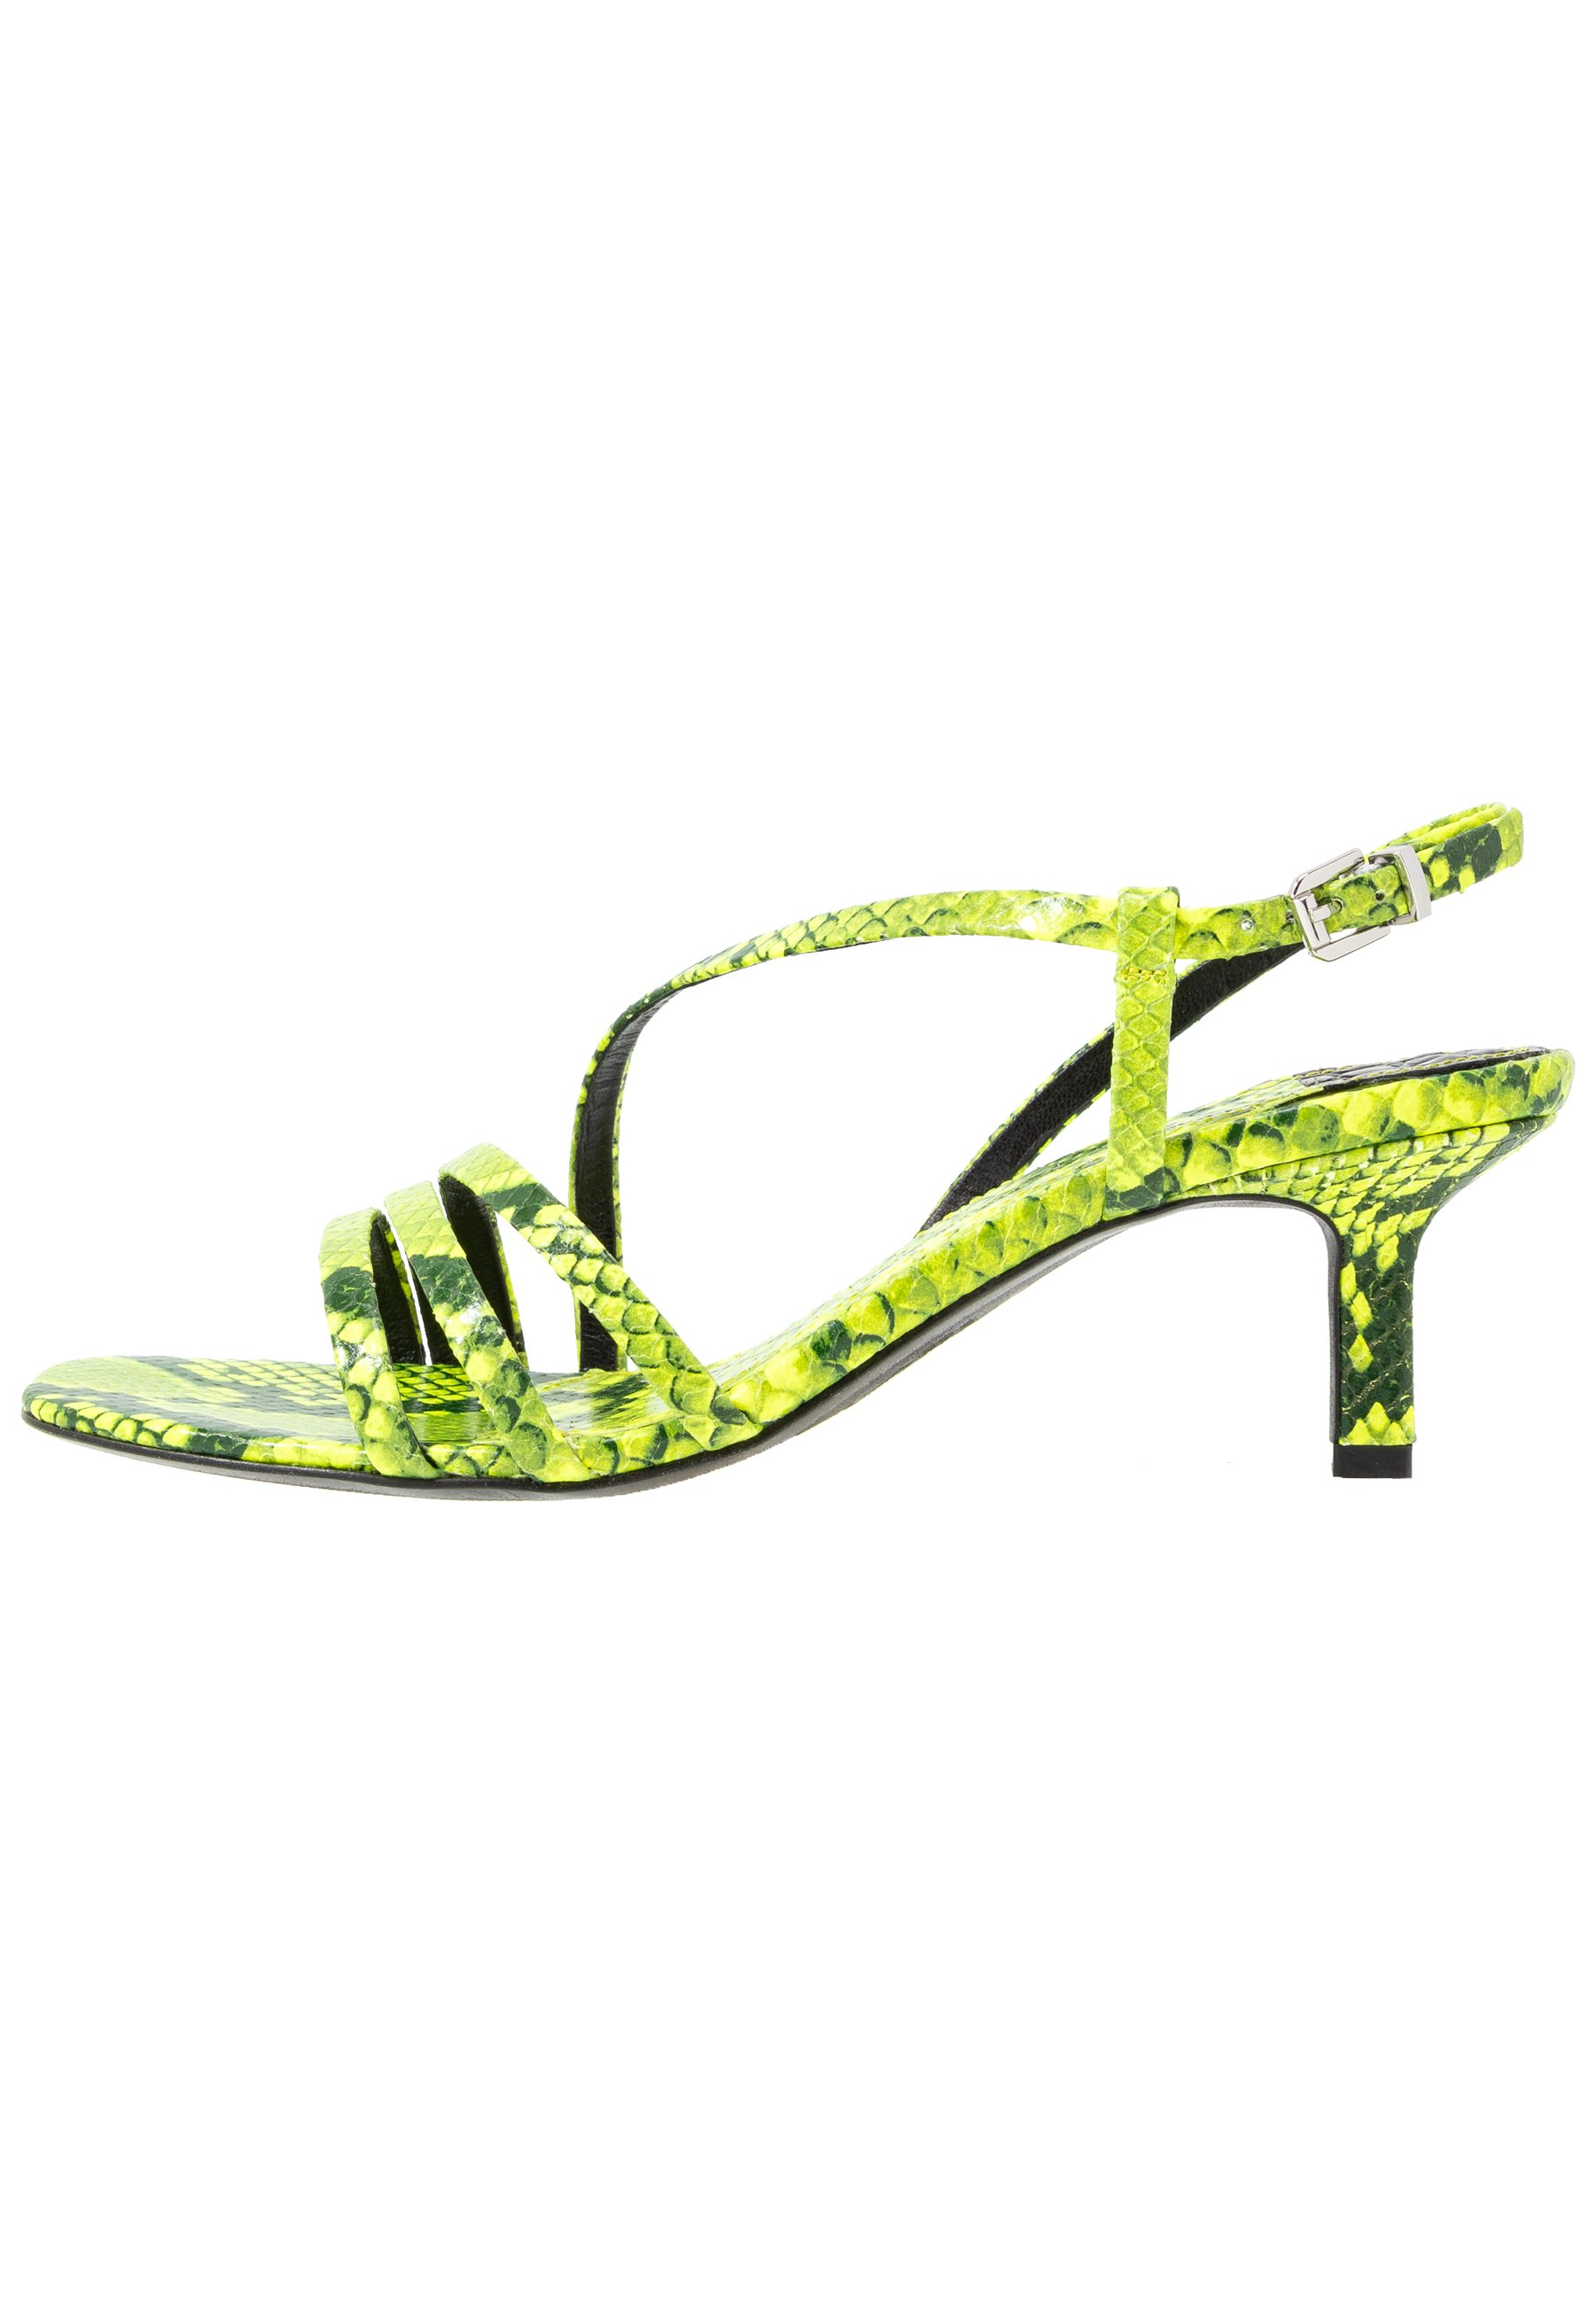 Kennel + Schmenger MISSY - Sandales - neon yellow